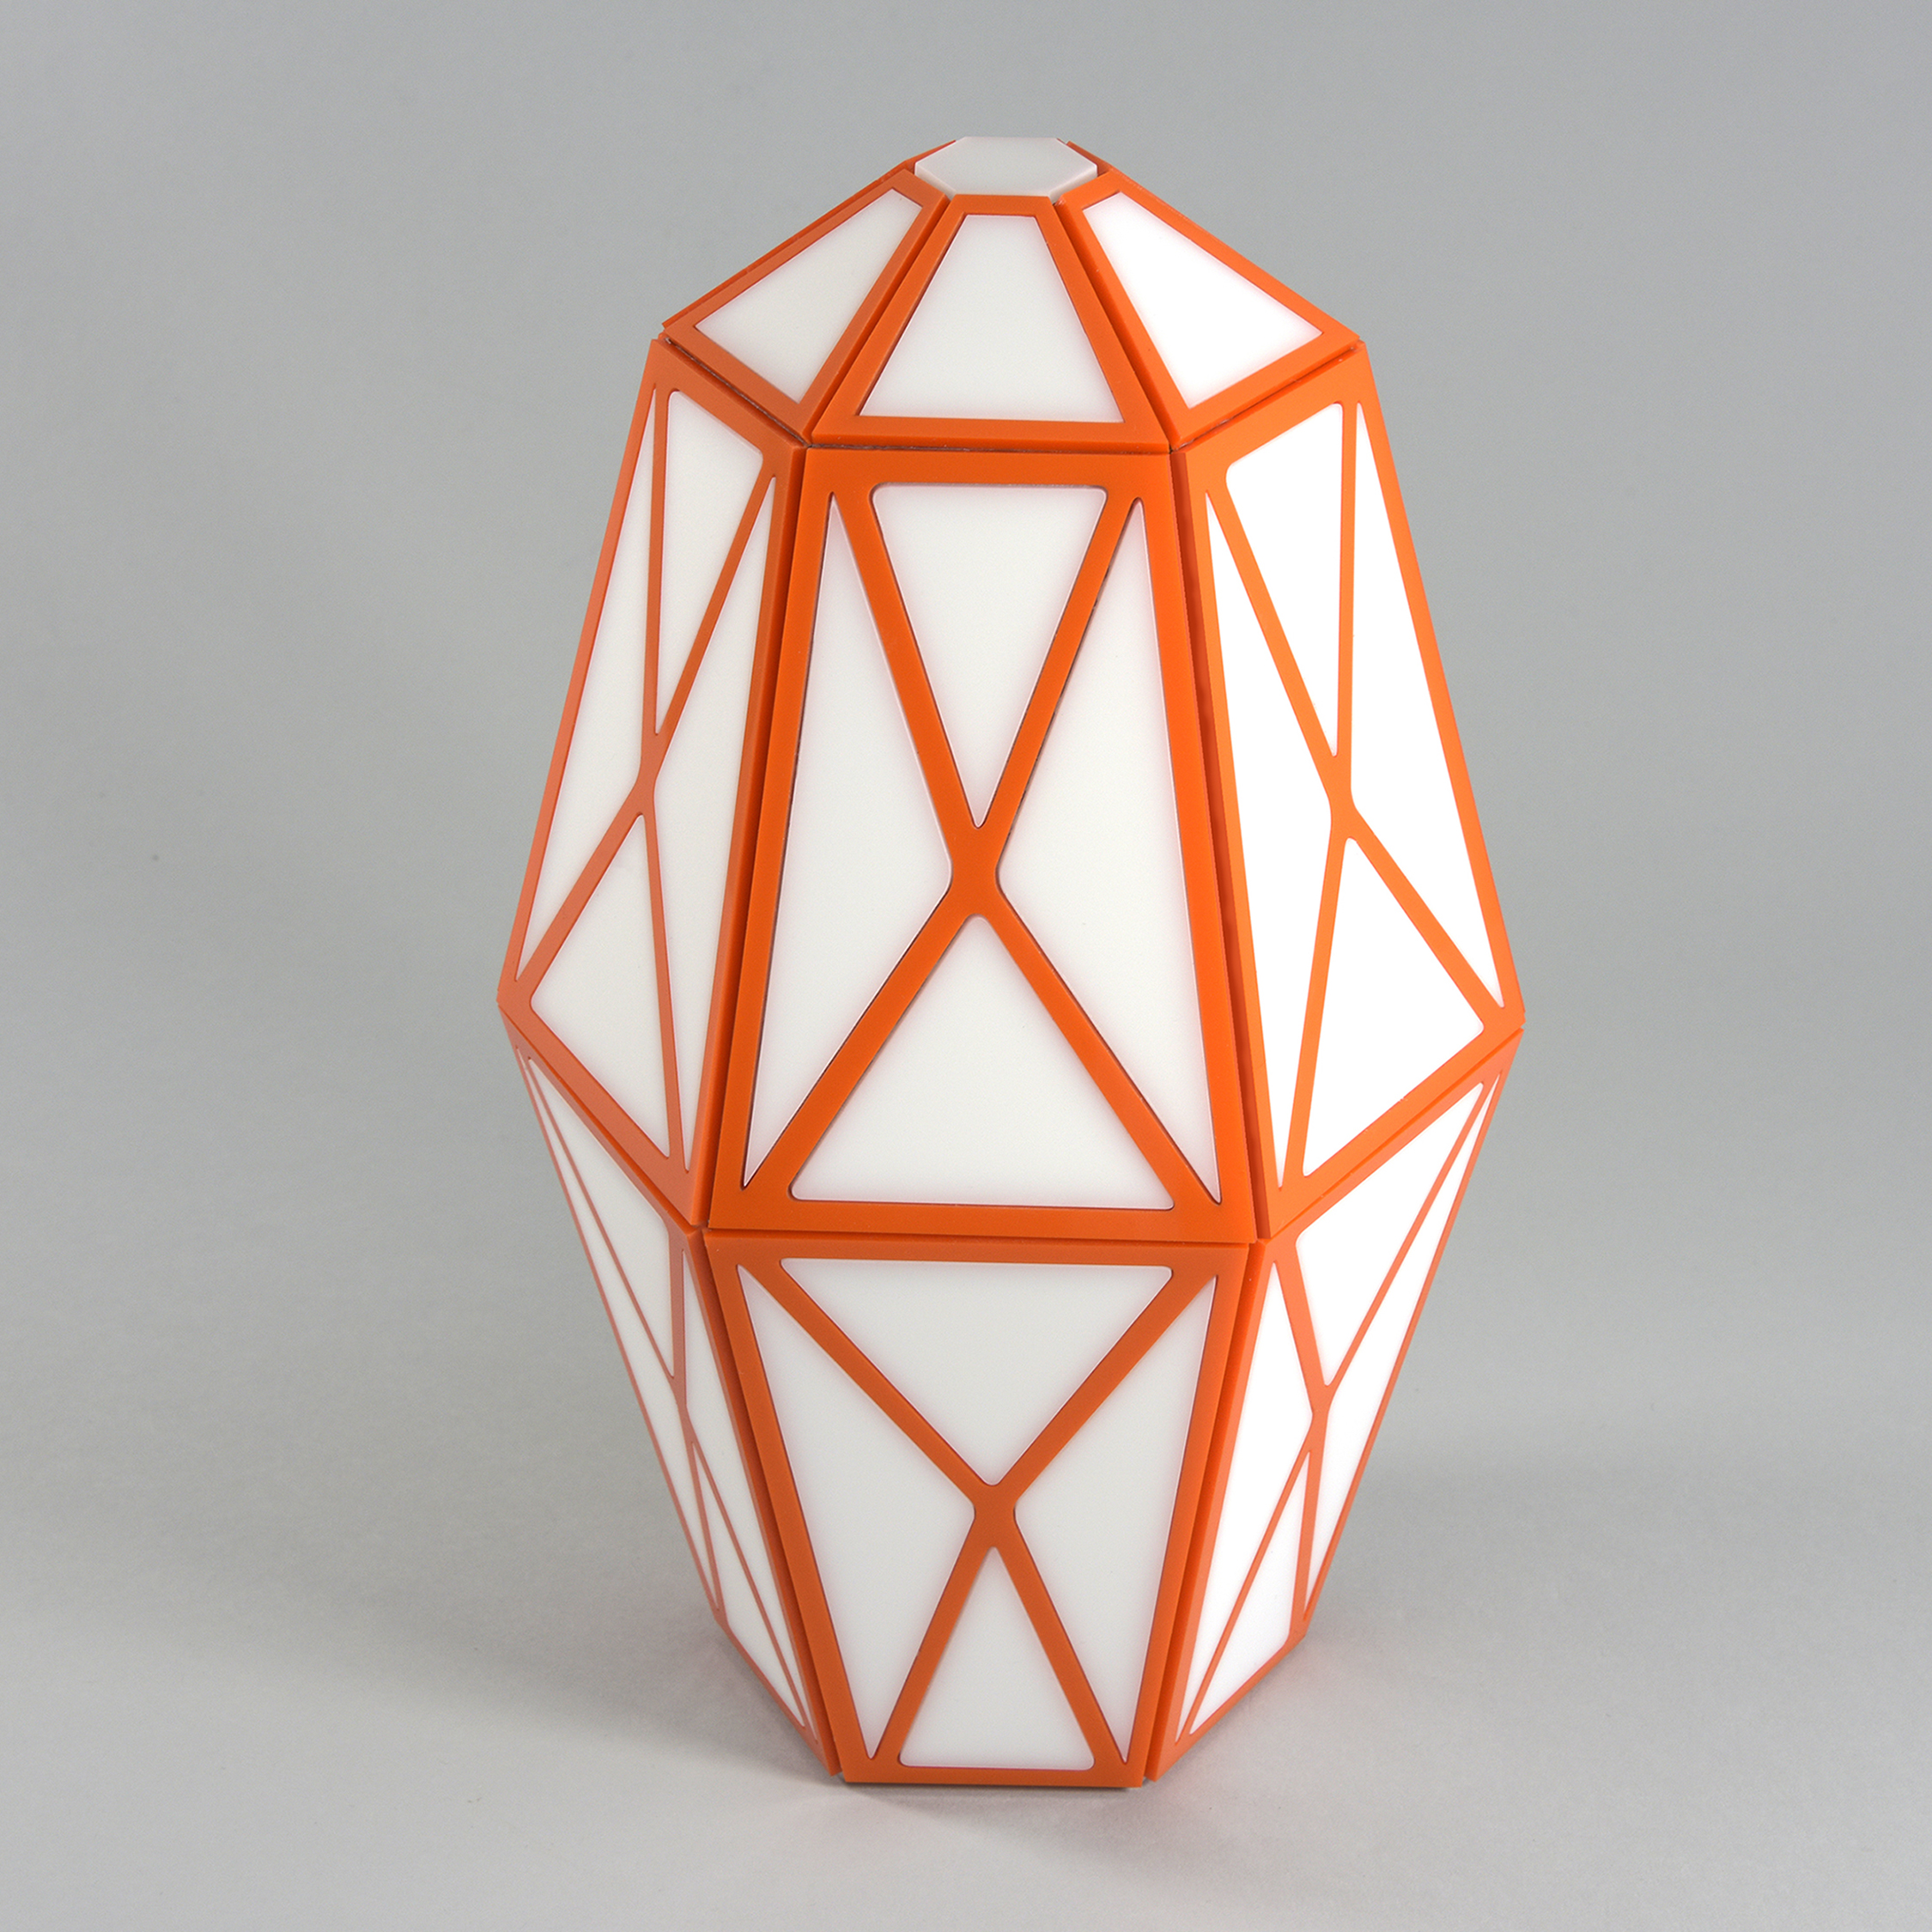 Vase (2017) by Stephen Hendee, sculpture